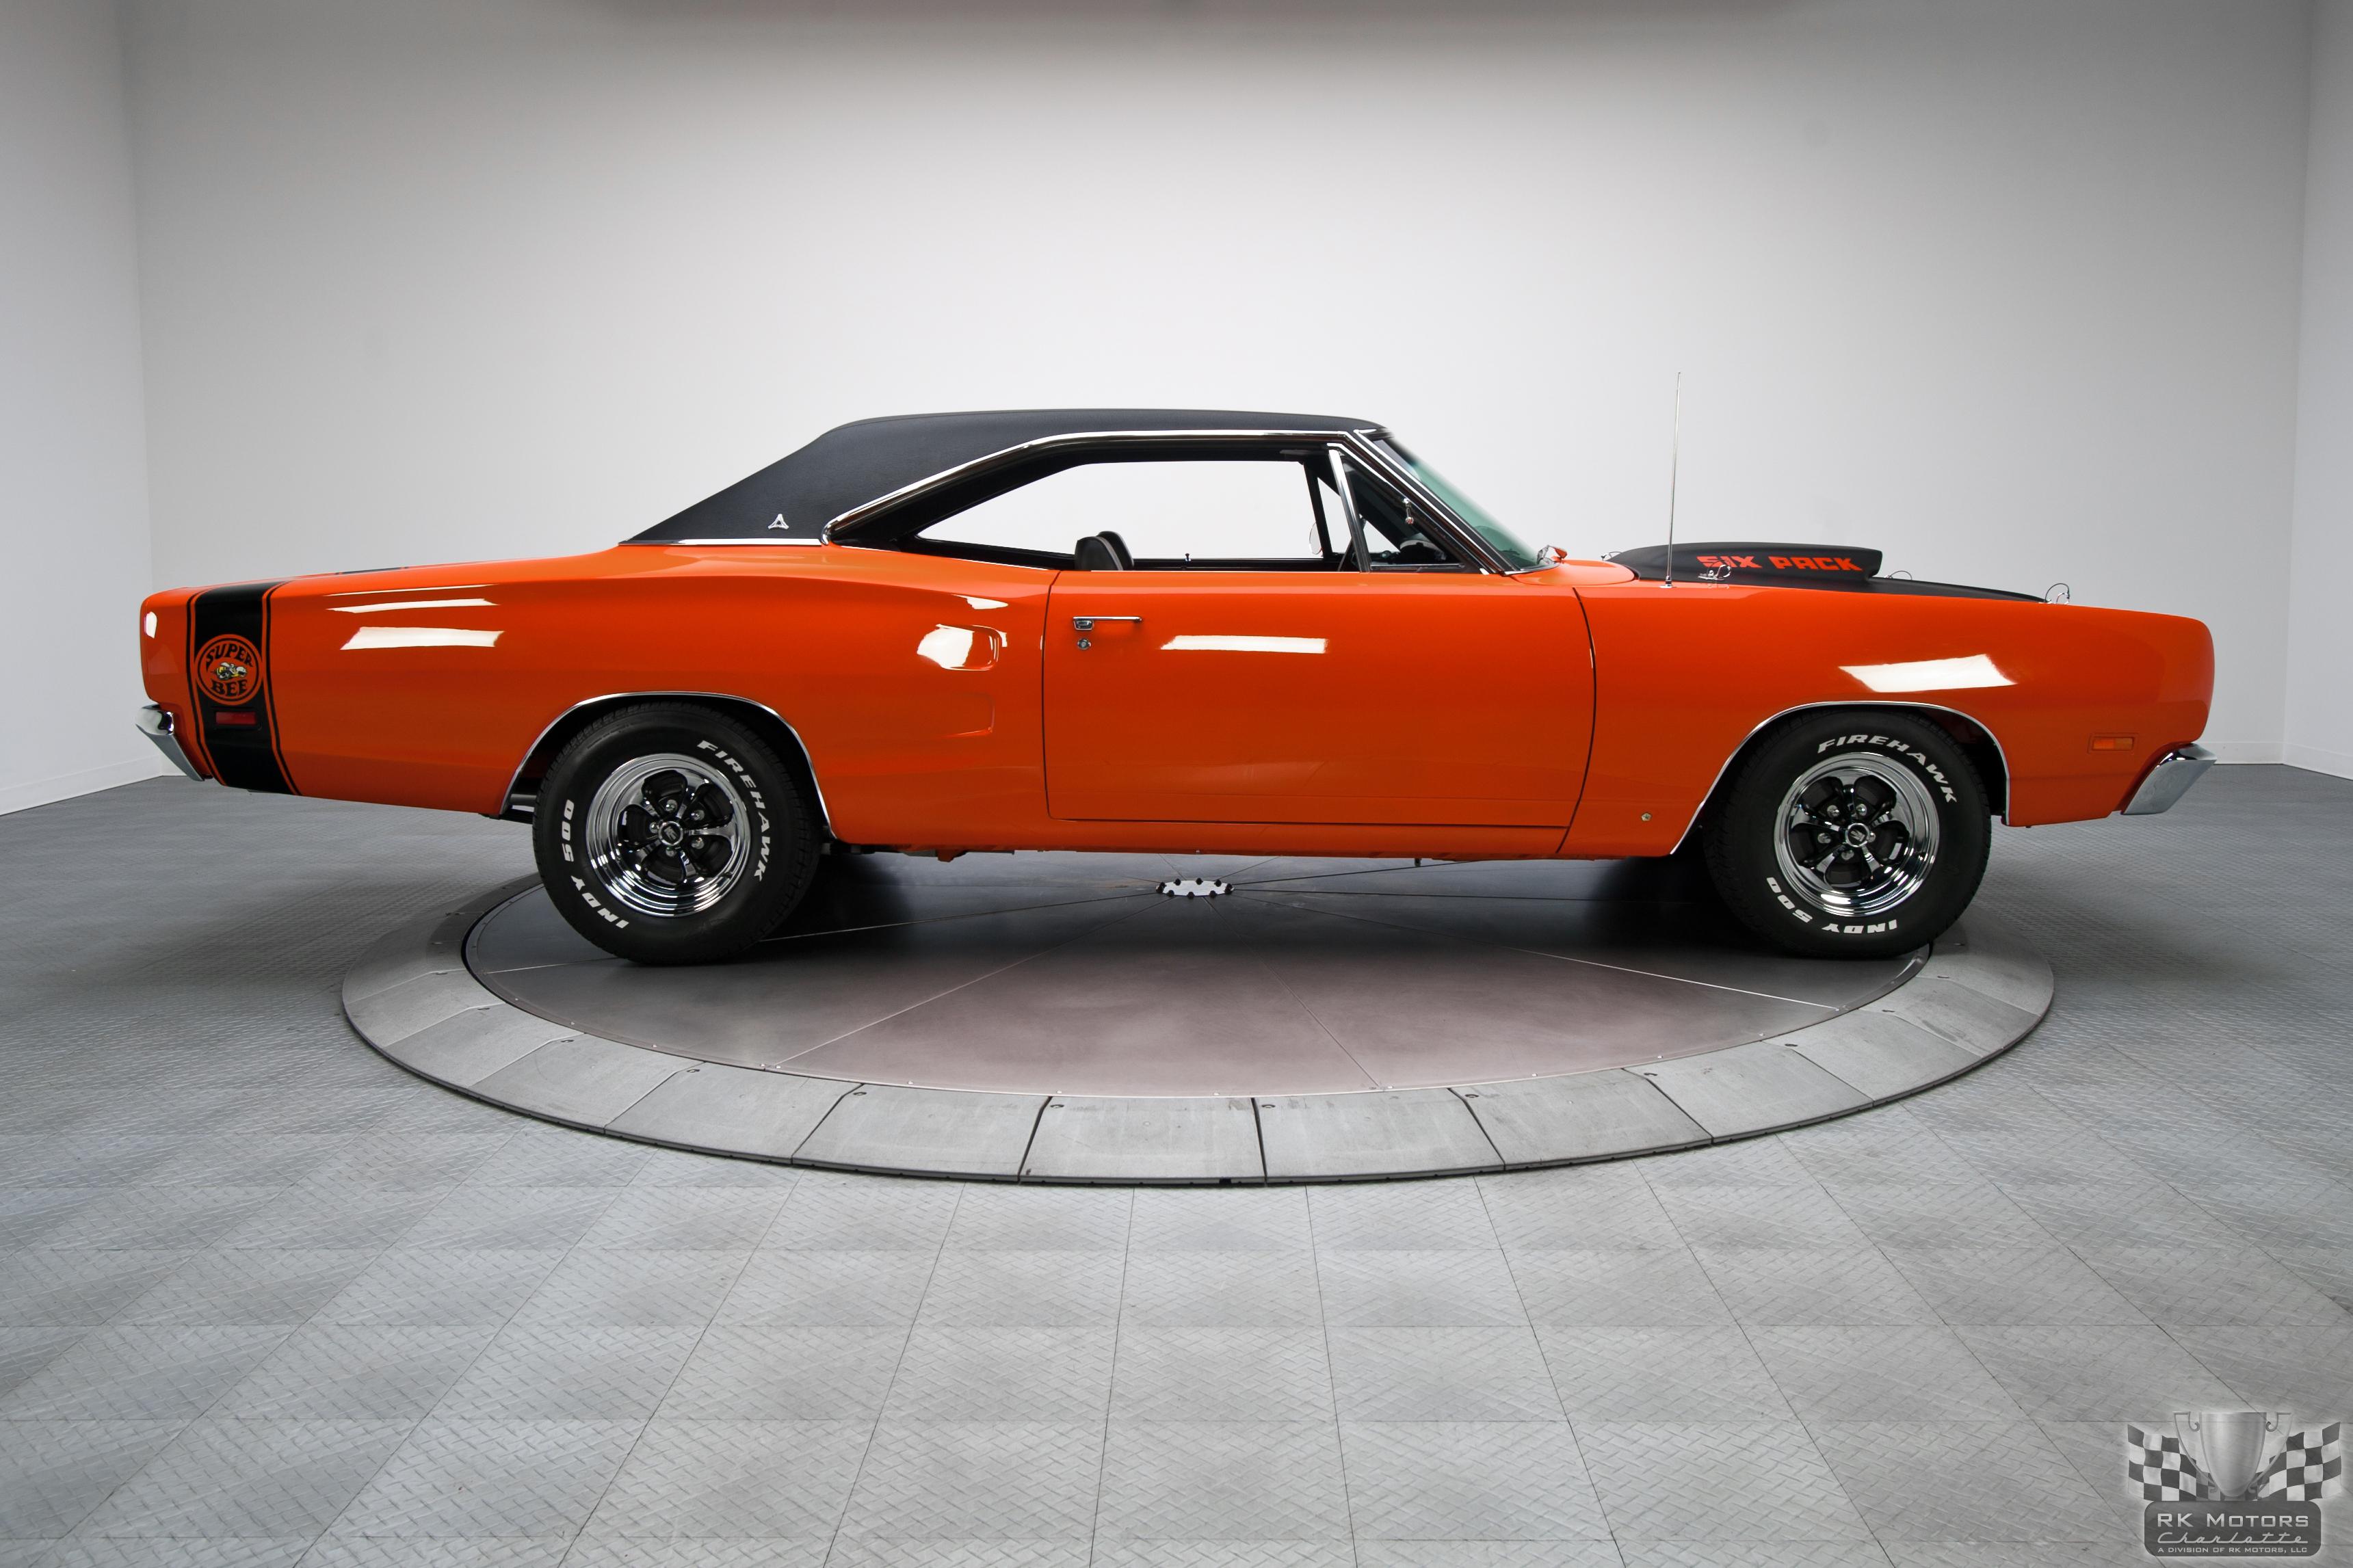 1969 Dodge Coronet A12 Super Bee Musclecars Hot Rods E